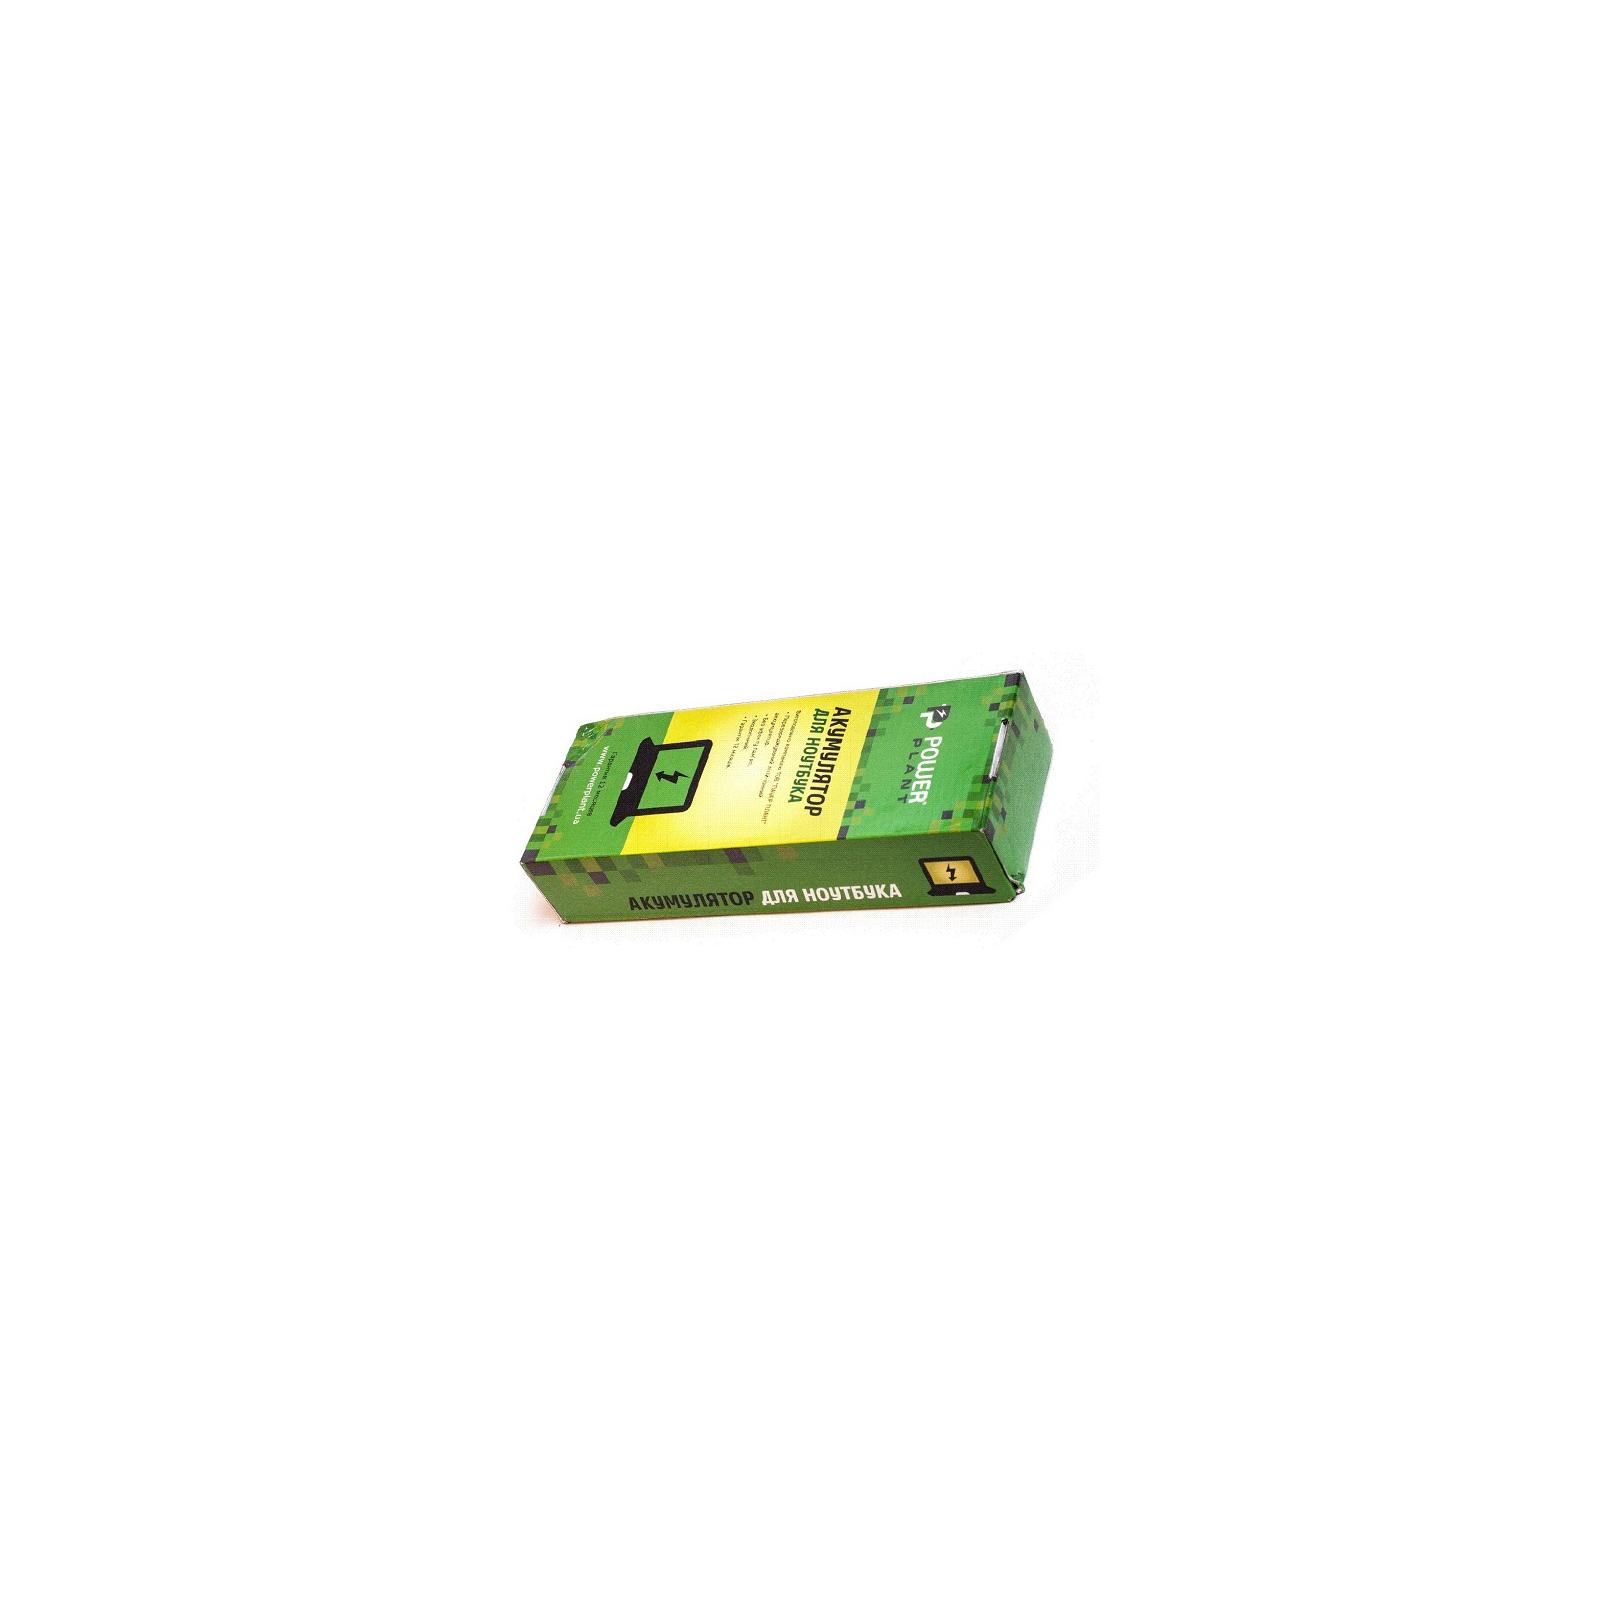 Аккумулятор для ноутбука HP 510-530 (HSTNN-IB45, H5530LH) 14.8V 5200mAh PowerPlant (NB00000125) изображение 3